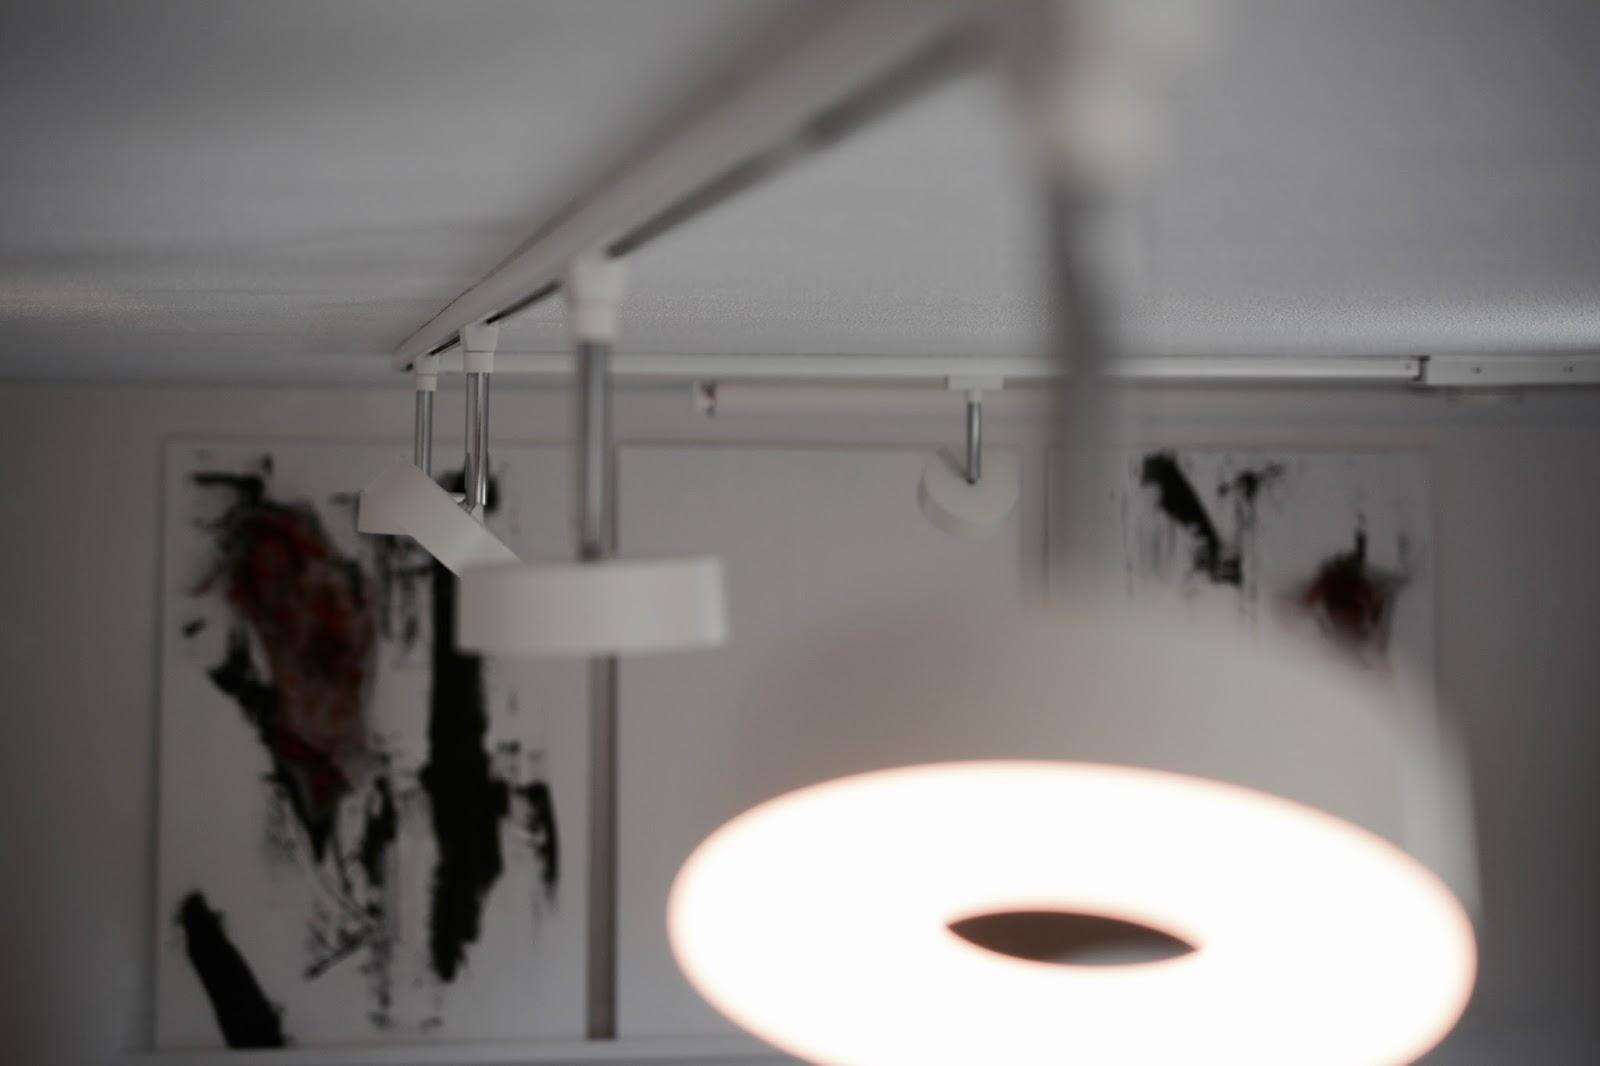 alexander gall lifestyle interior magazine light up your home paulmann urail. Black Bedroom Furniture Sets. Home Design Ideas